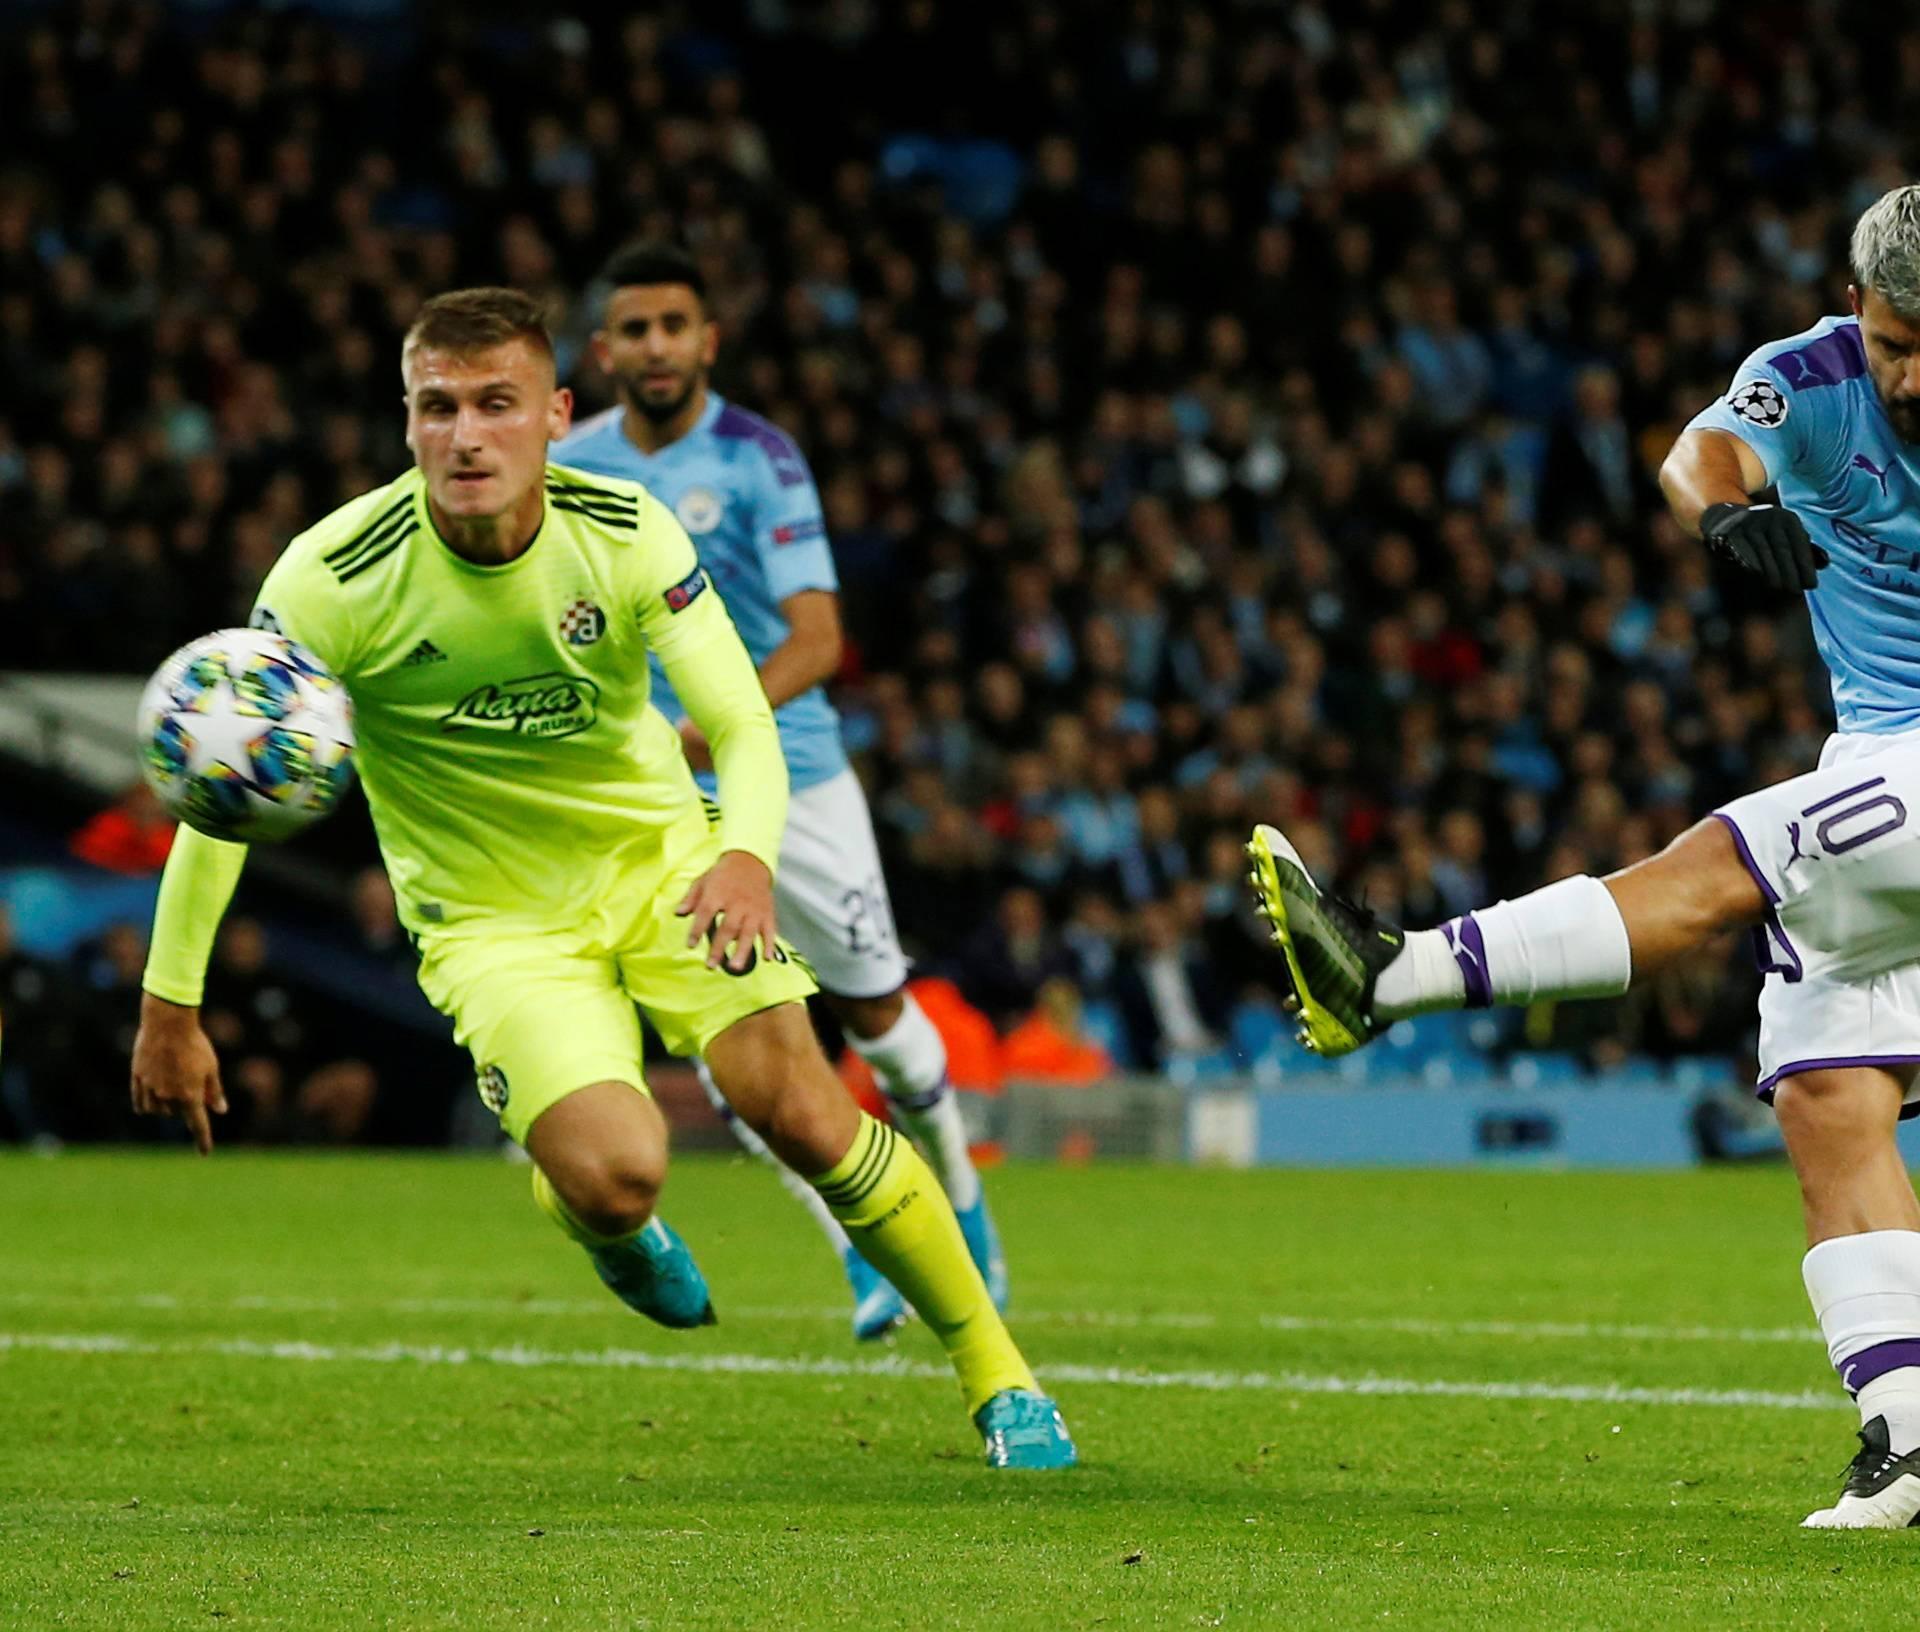 Champions League - Group C - Manchester City v GNK Dinamo Zagreb